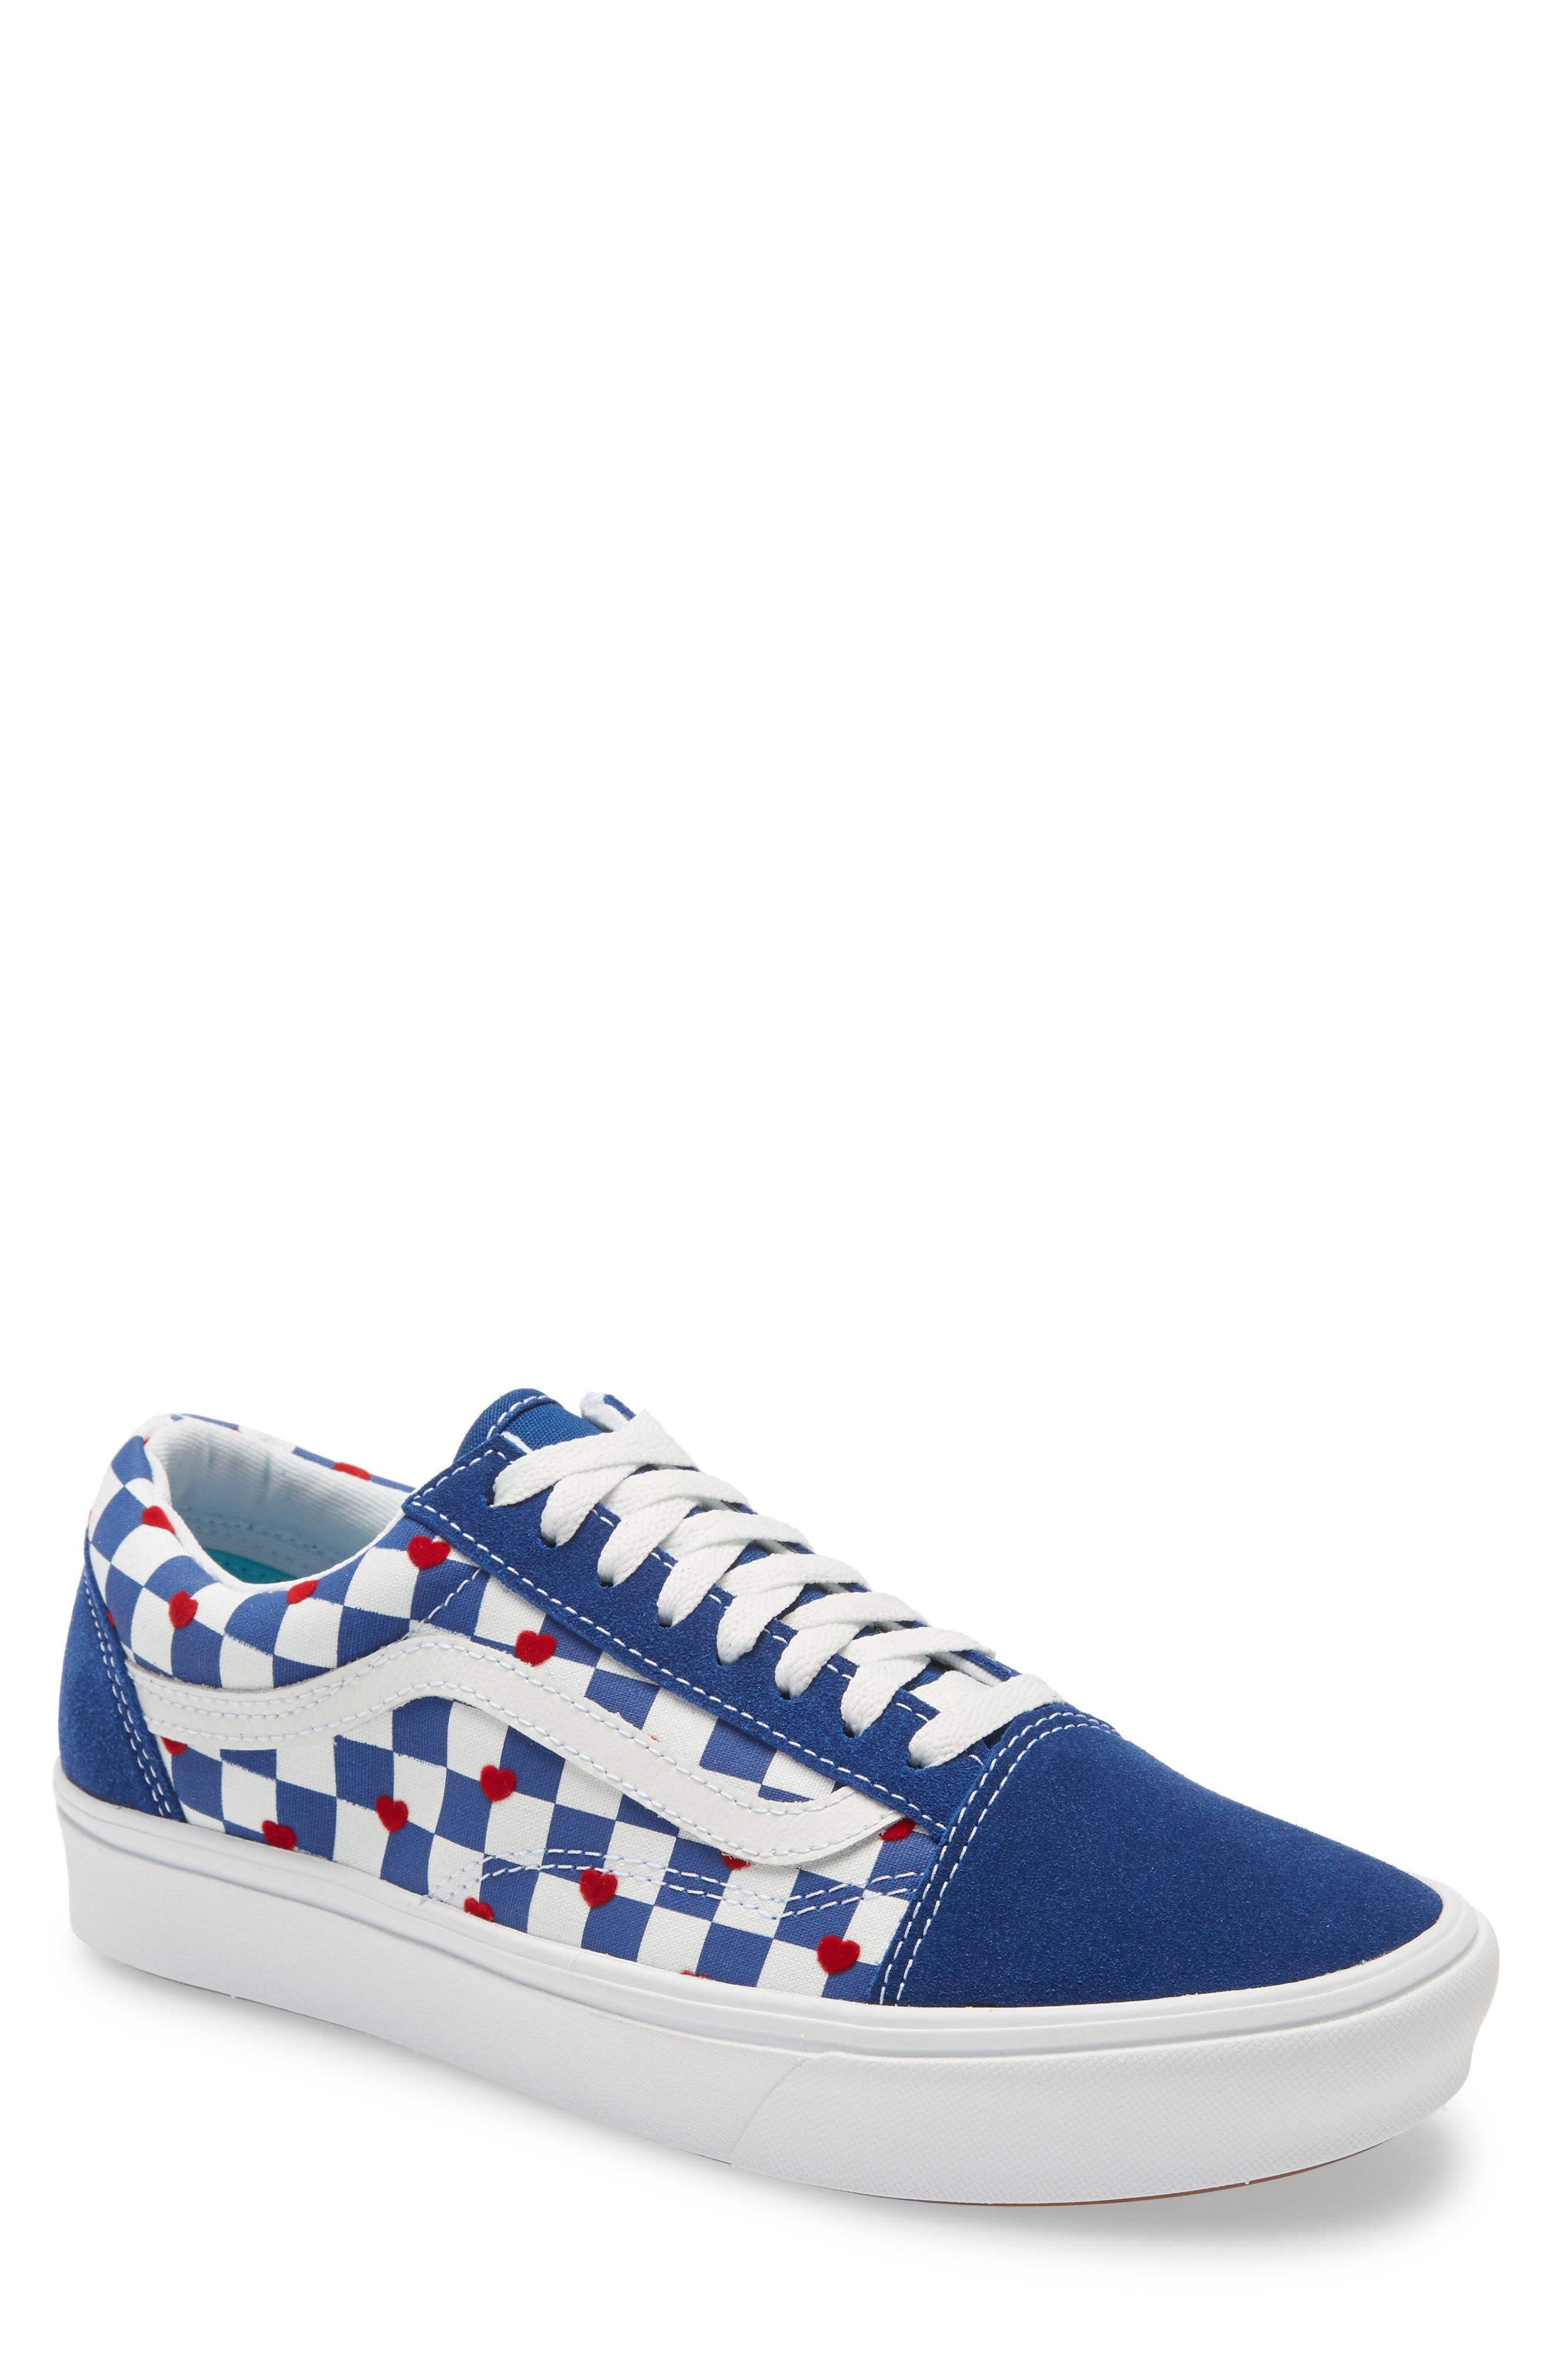 Mens Retro Shoes | Vintage Shoes & Boots Mens Vans Autism Awareness Comfycush Old Skool Sneaker $74.95 AT vintagedancer.com